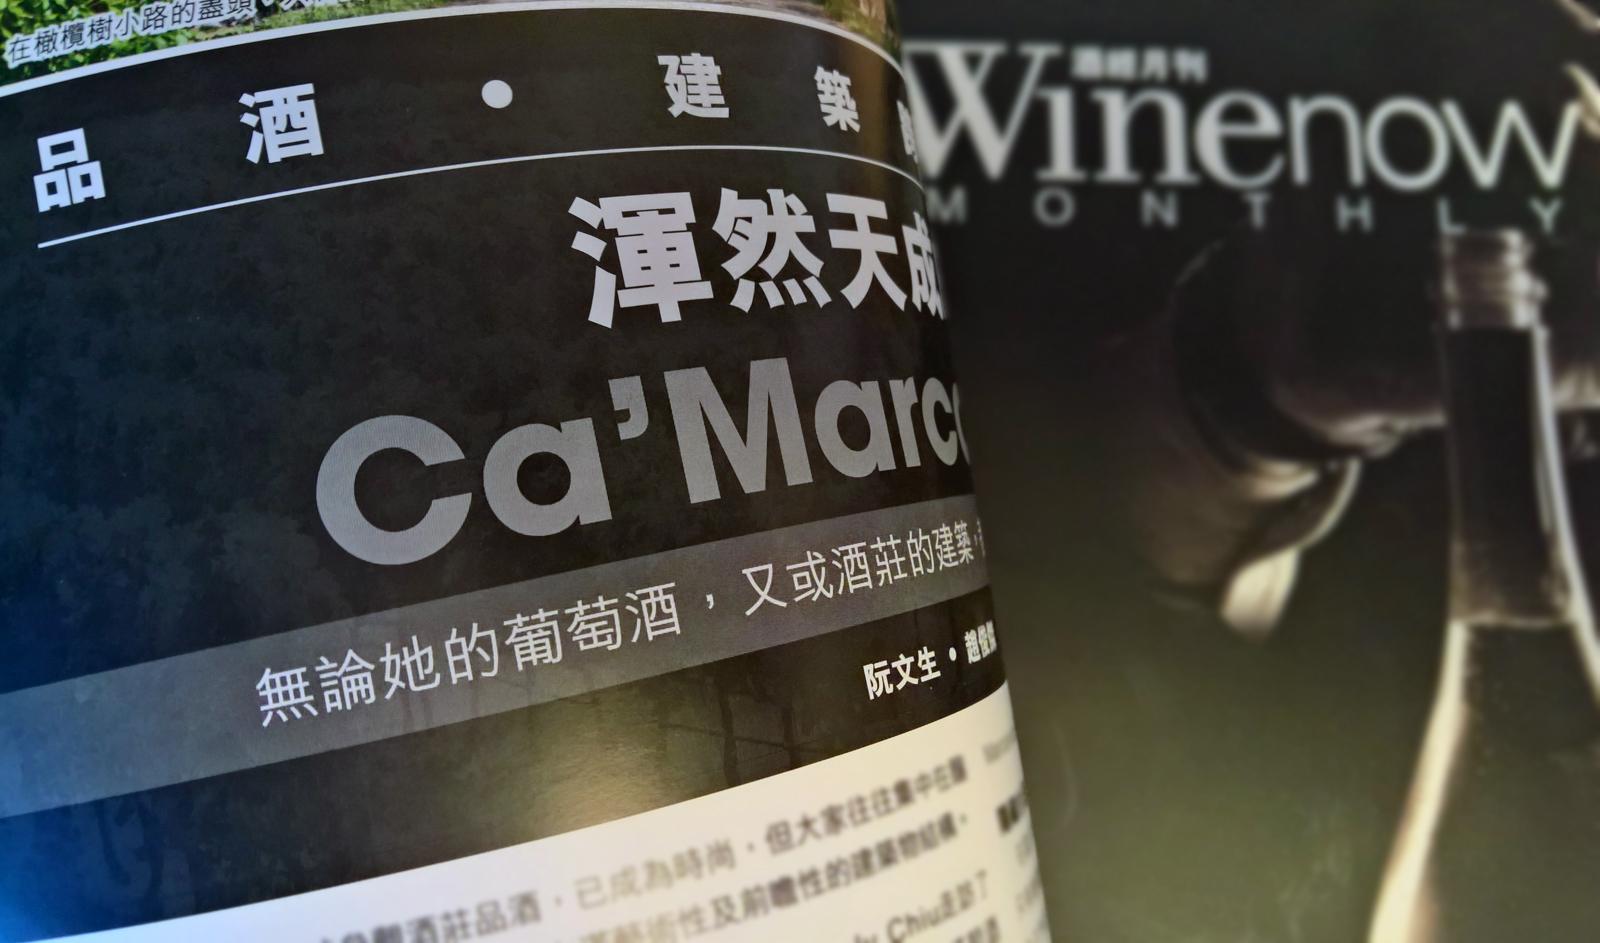 Winenow 2017年10月號的文章 - 渾然天成的Ca'Marcanda